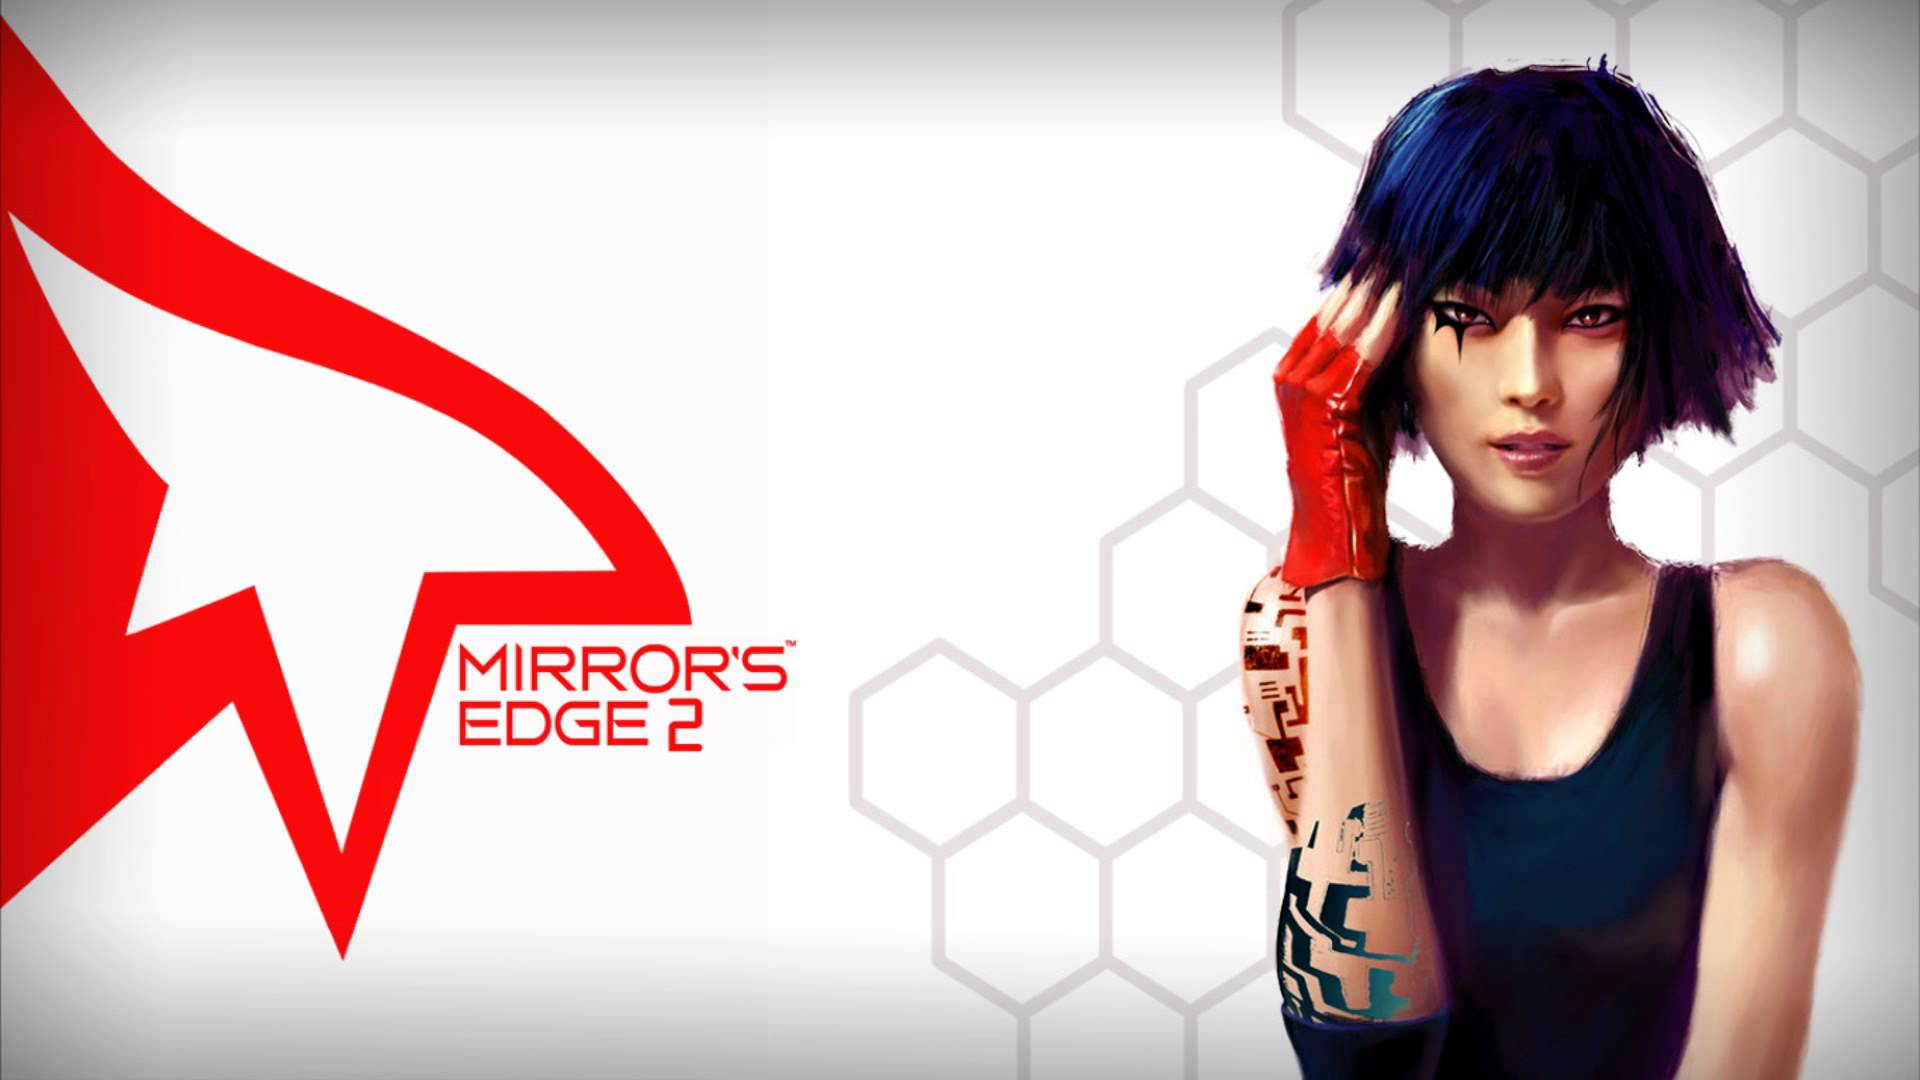 Mirrors Edge 2